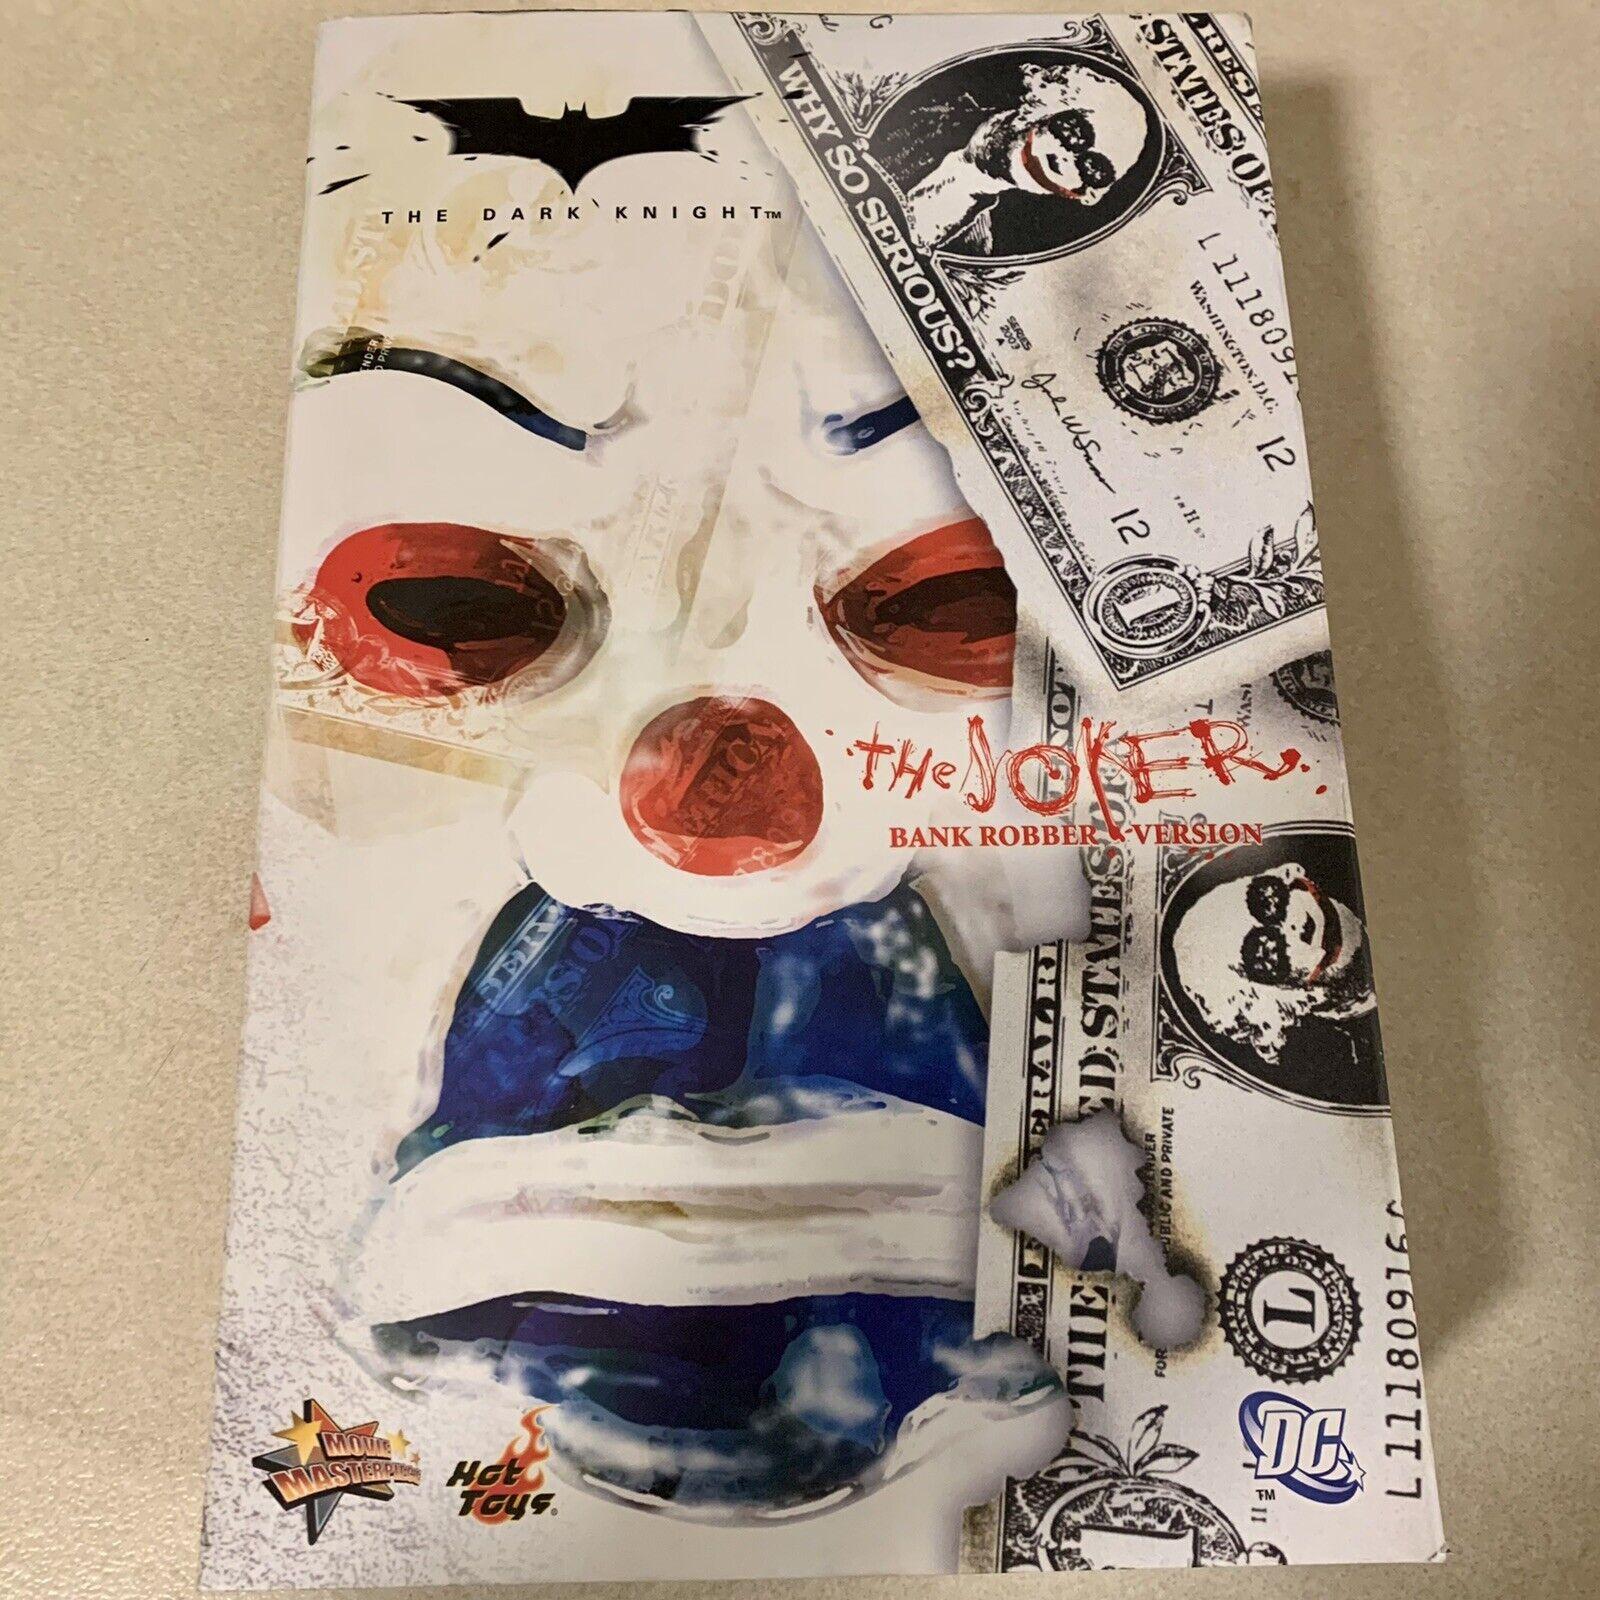 Hot Toys MMS 79 Batman The Dark Knight The Joker (Bank Robber Version 1.0) on eBay thumbnail